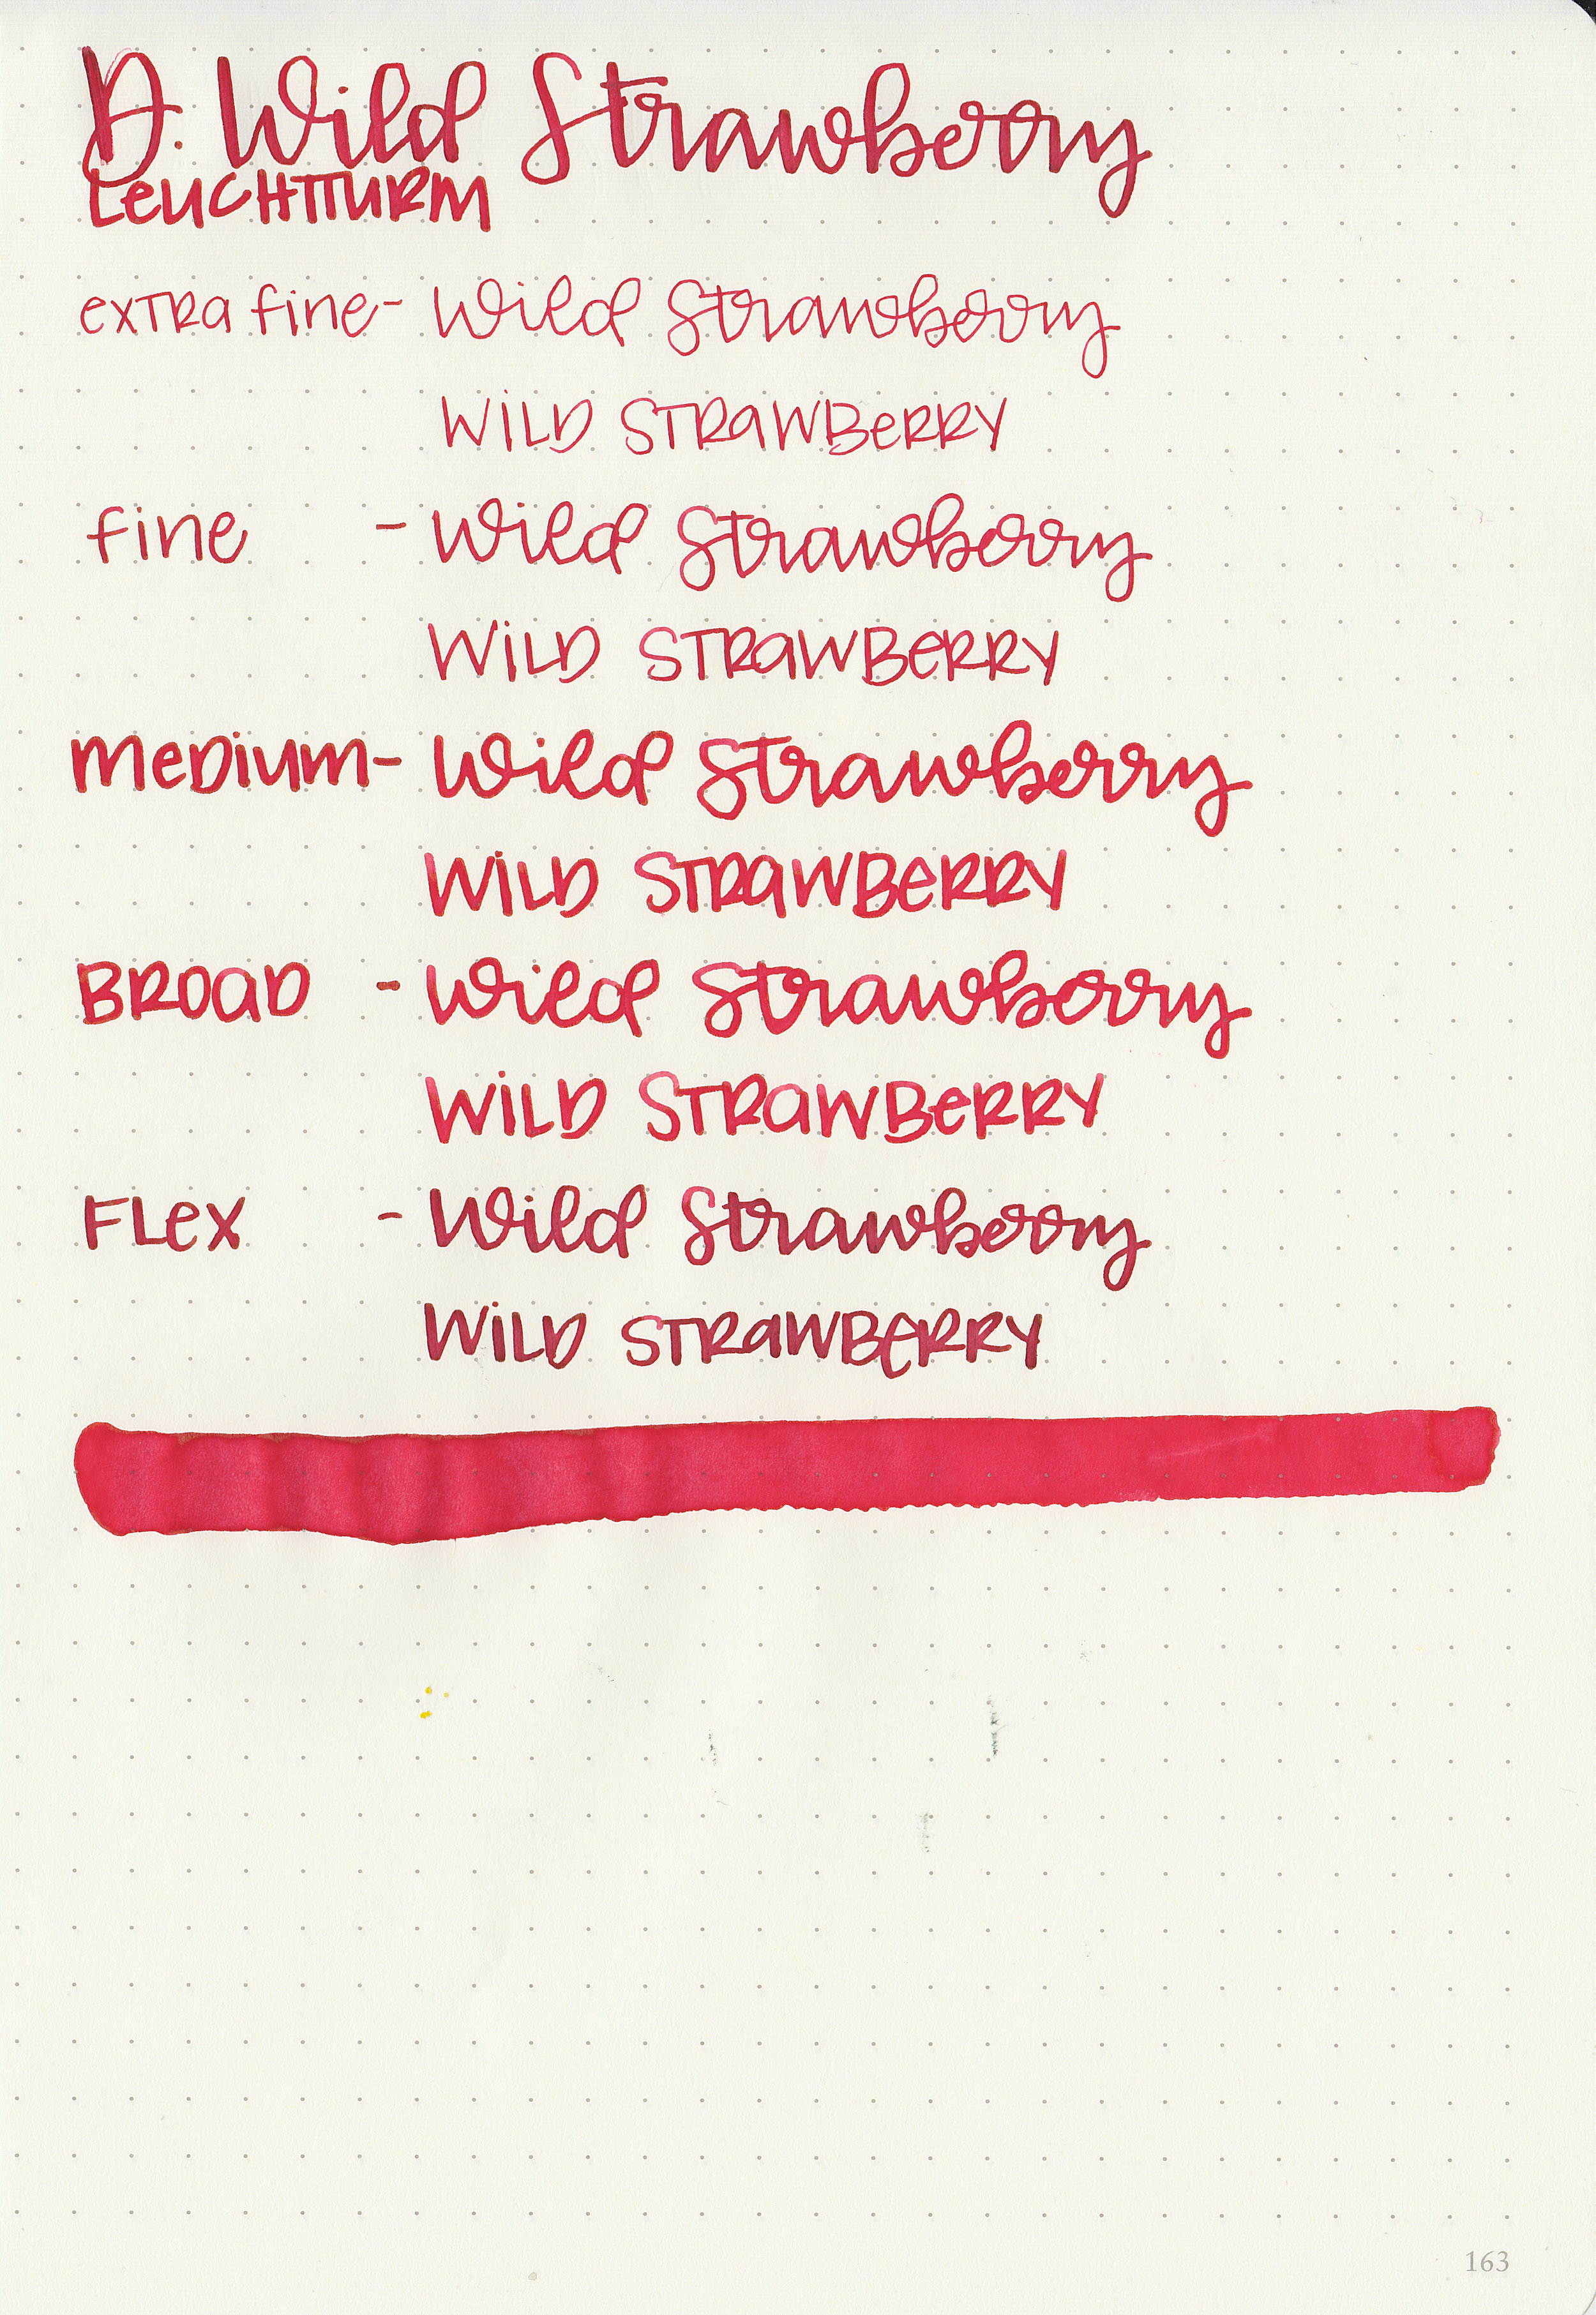 d-wild-strawberry-9.jpg